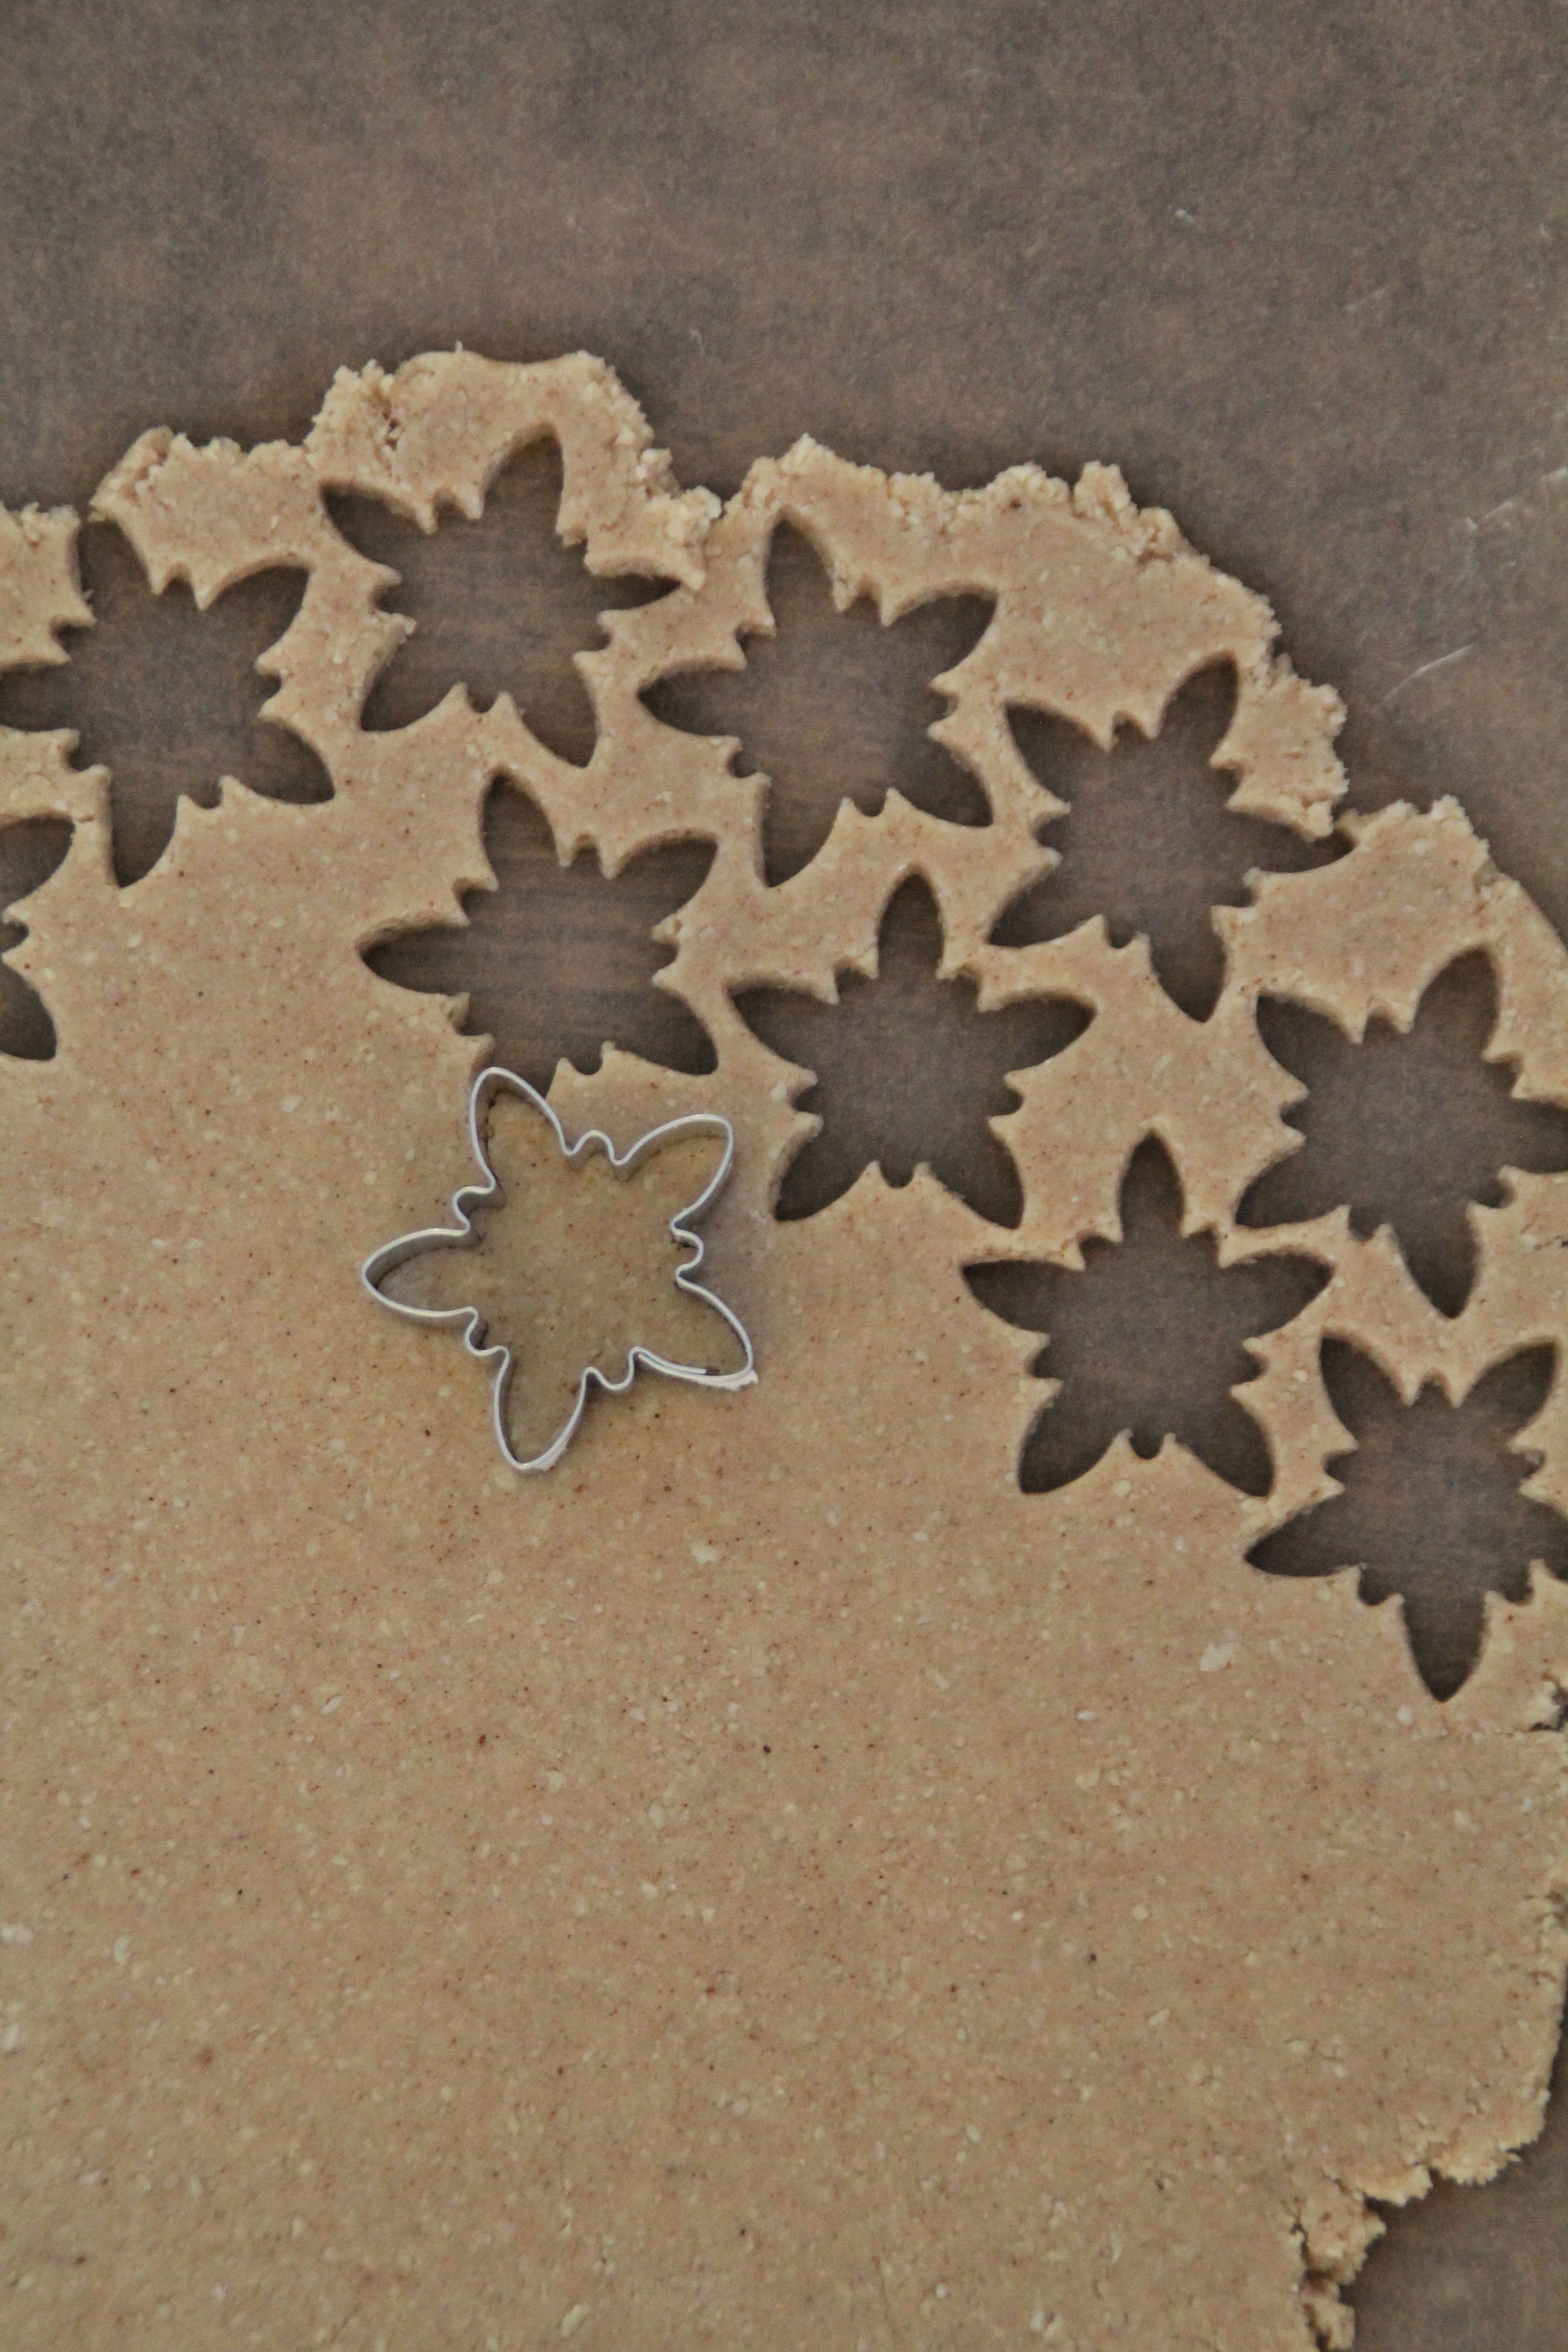 Kanelstjerner (Zimtsterne)